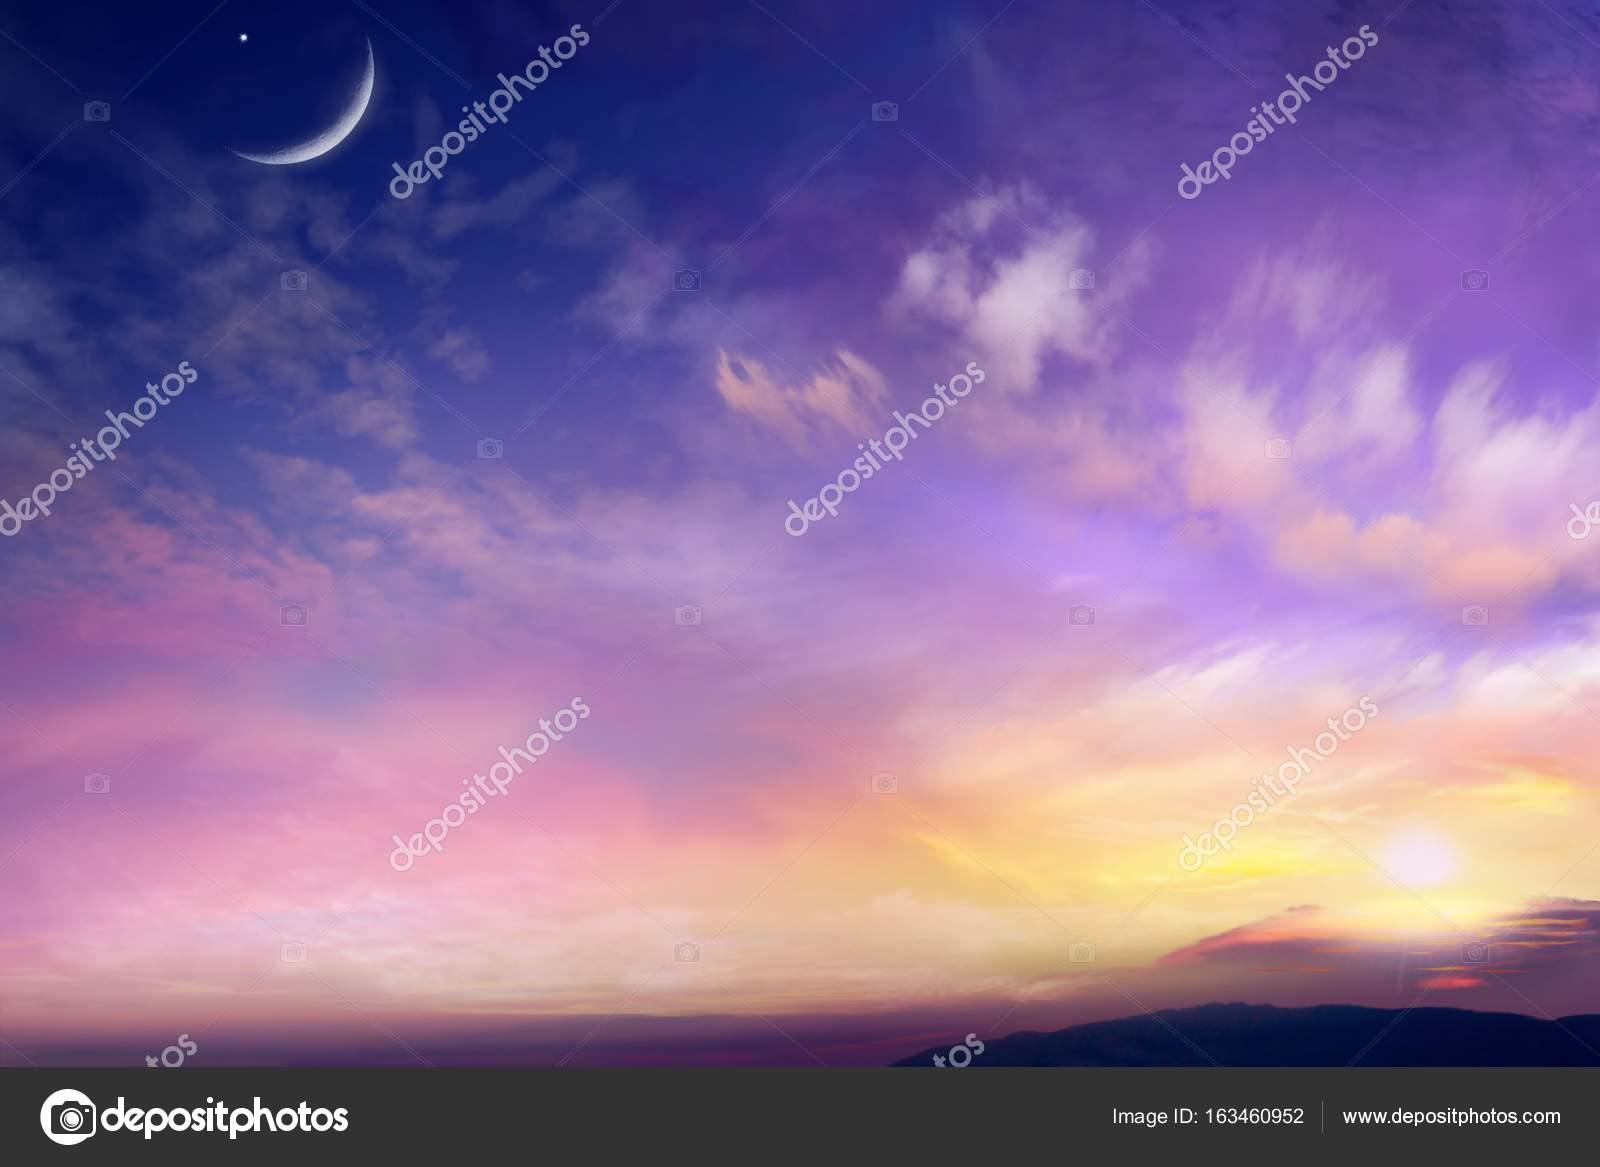 Beautiful Scenery Dramatic Nature Background Stock Photo